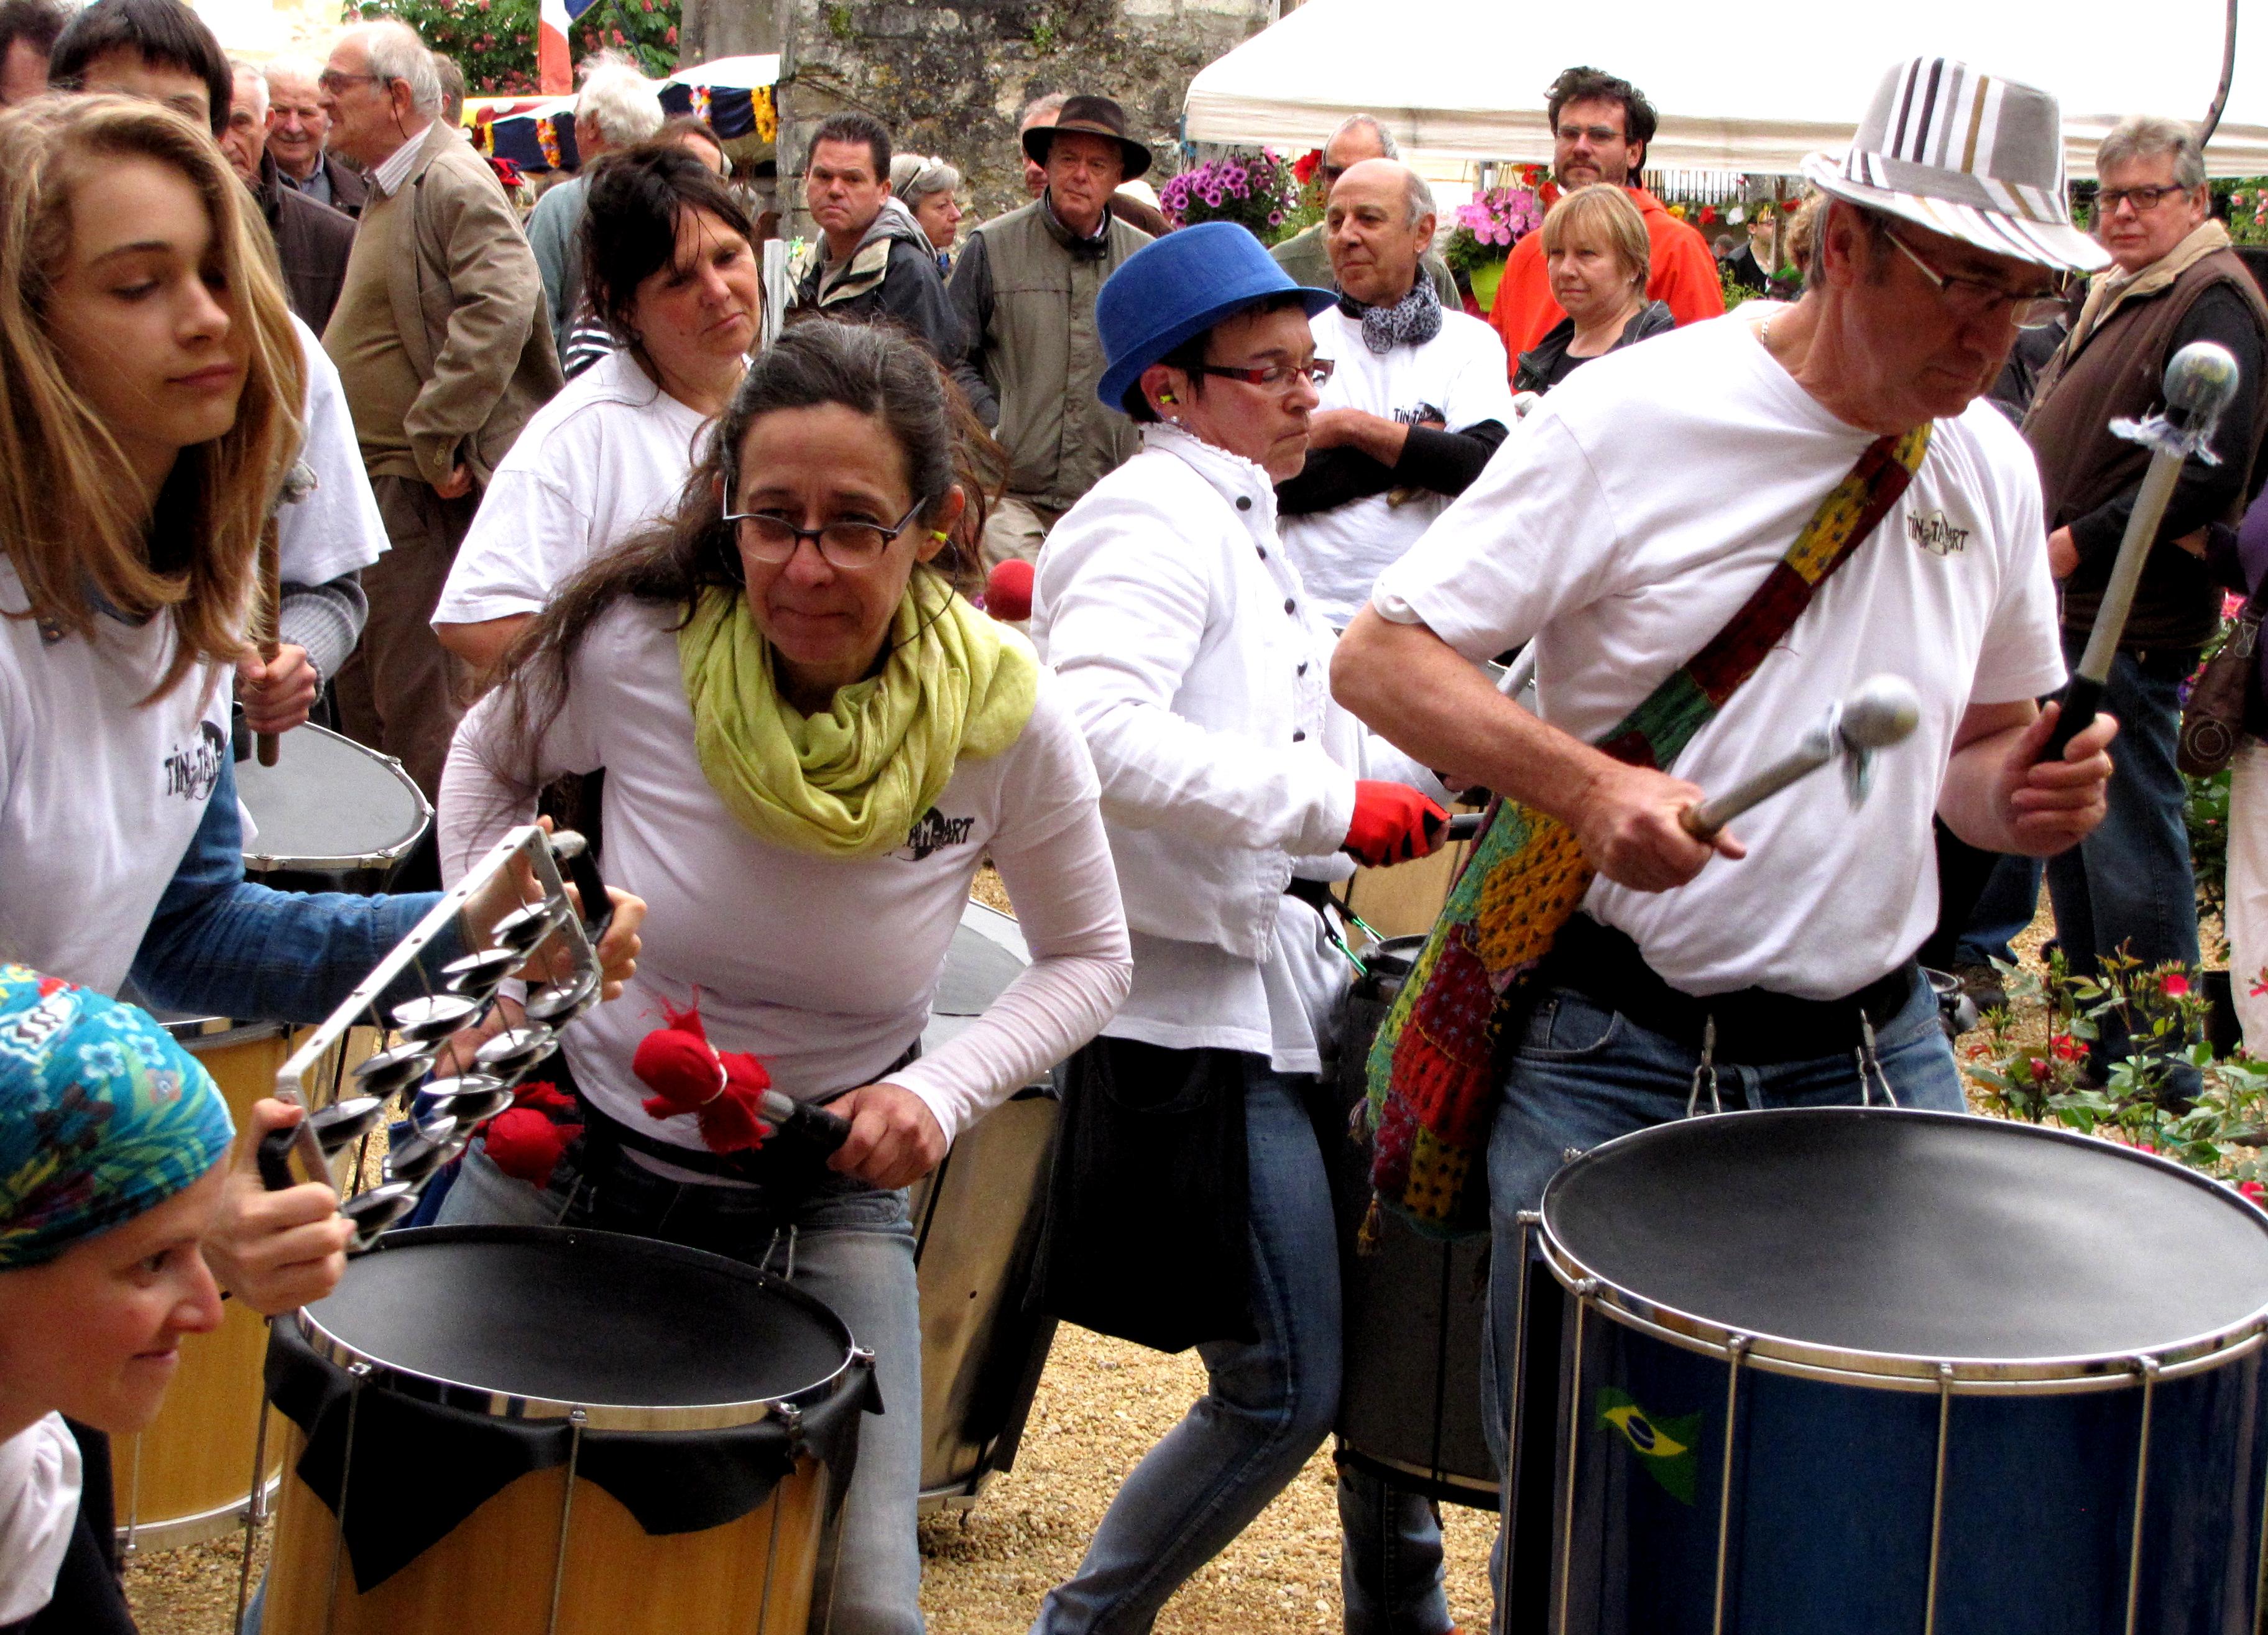 Samba d'Oc à la fête des voisins